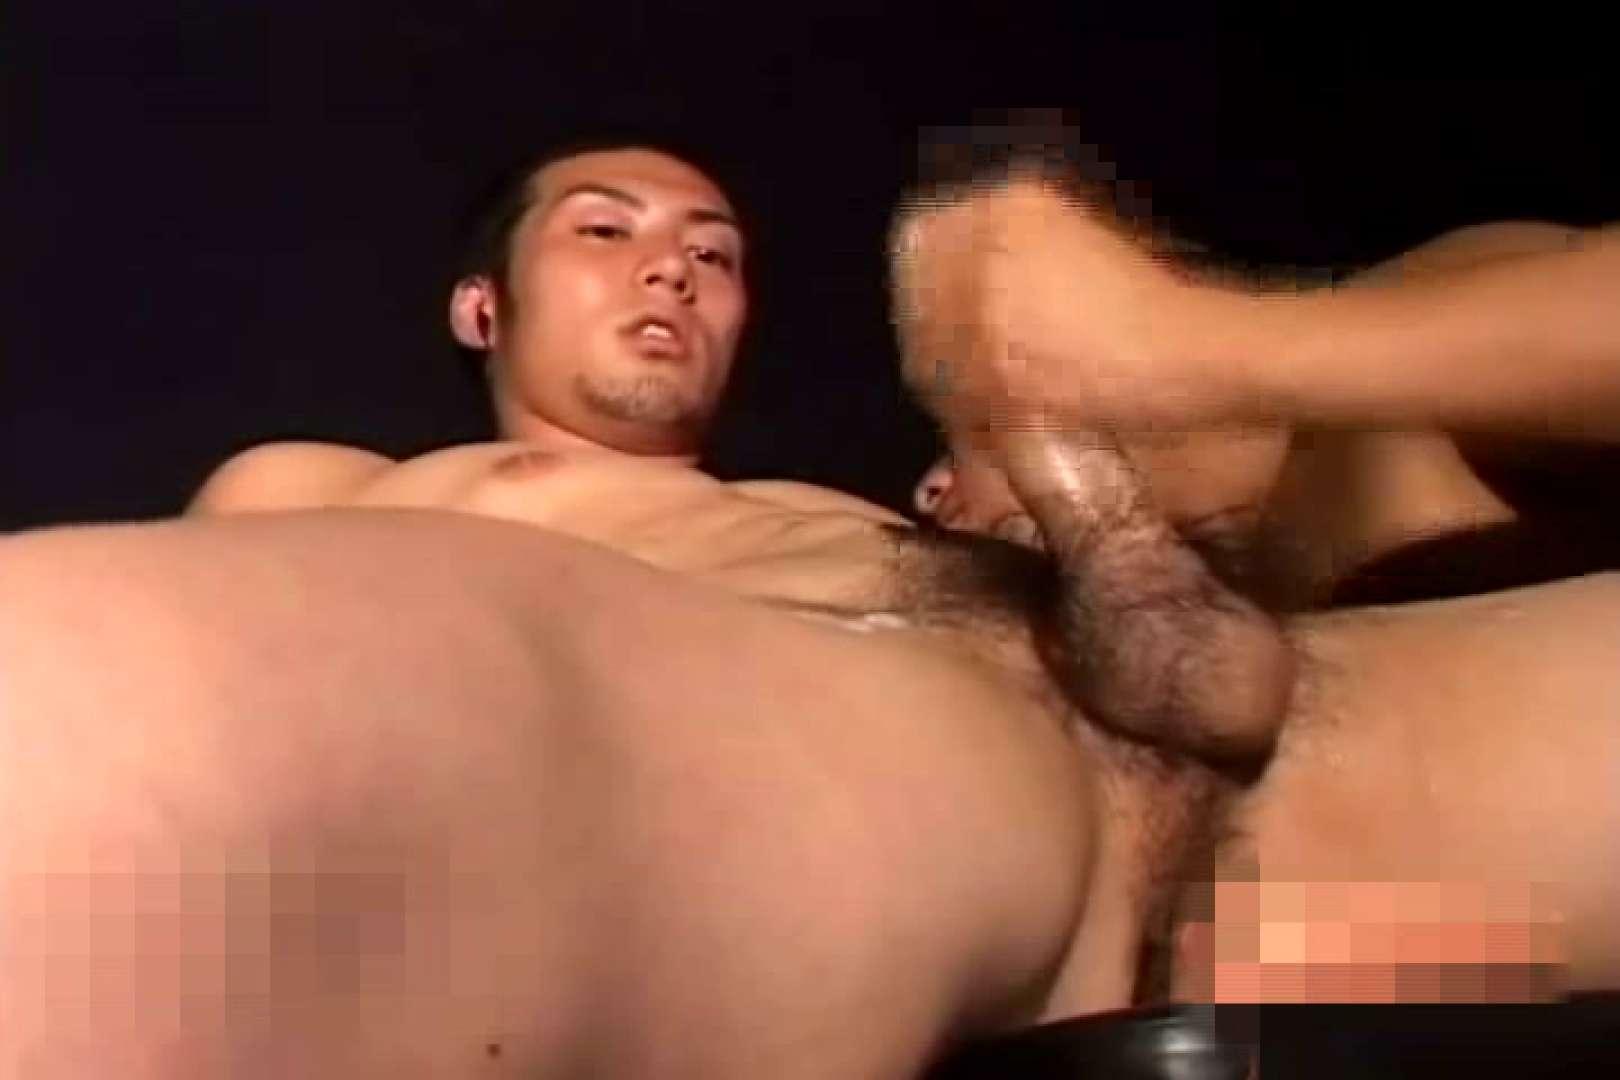 Beautiful muscle モッコリ野郎達!Vol.04 フェラDE絶頂 | イケメンのsex  103pic 10